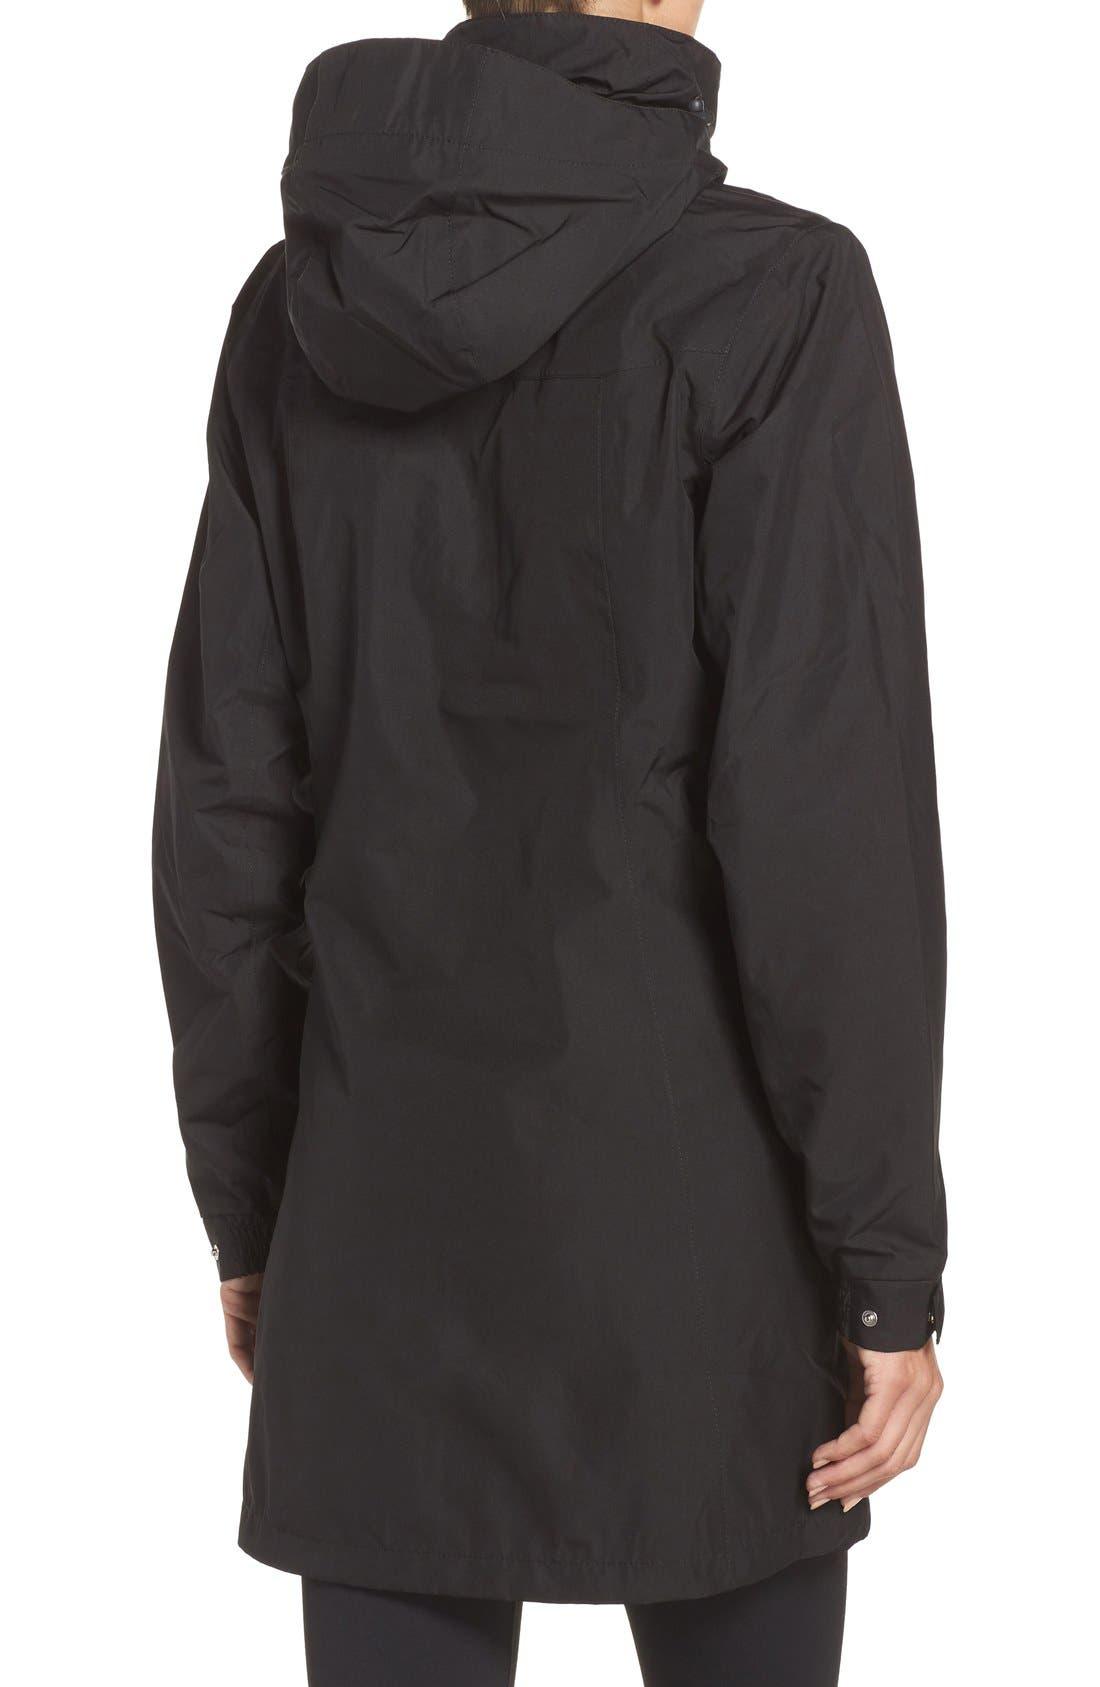 HELLY HANSEN, 'Aden' Helly Tech<sup>®</sup> Raincoat, Alternate thumbnail 5, color, BLACK